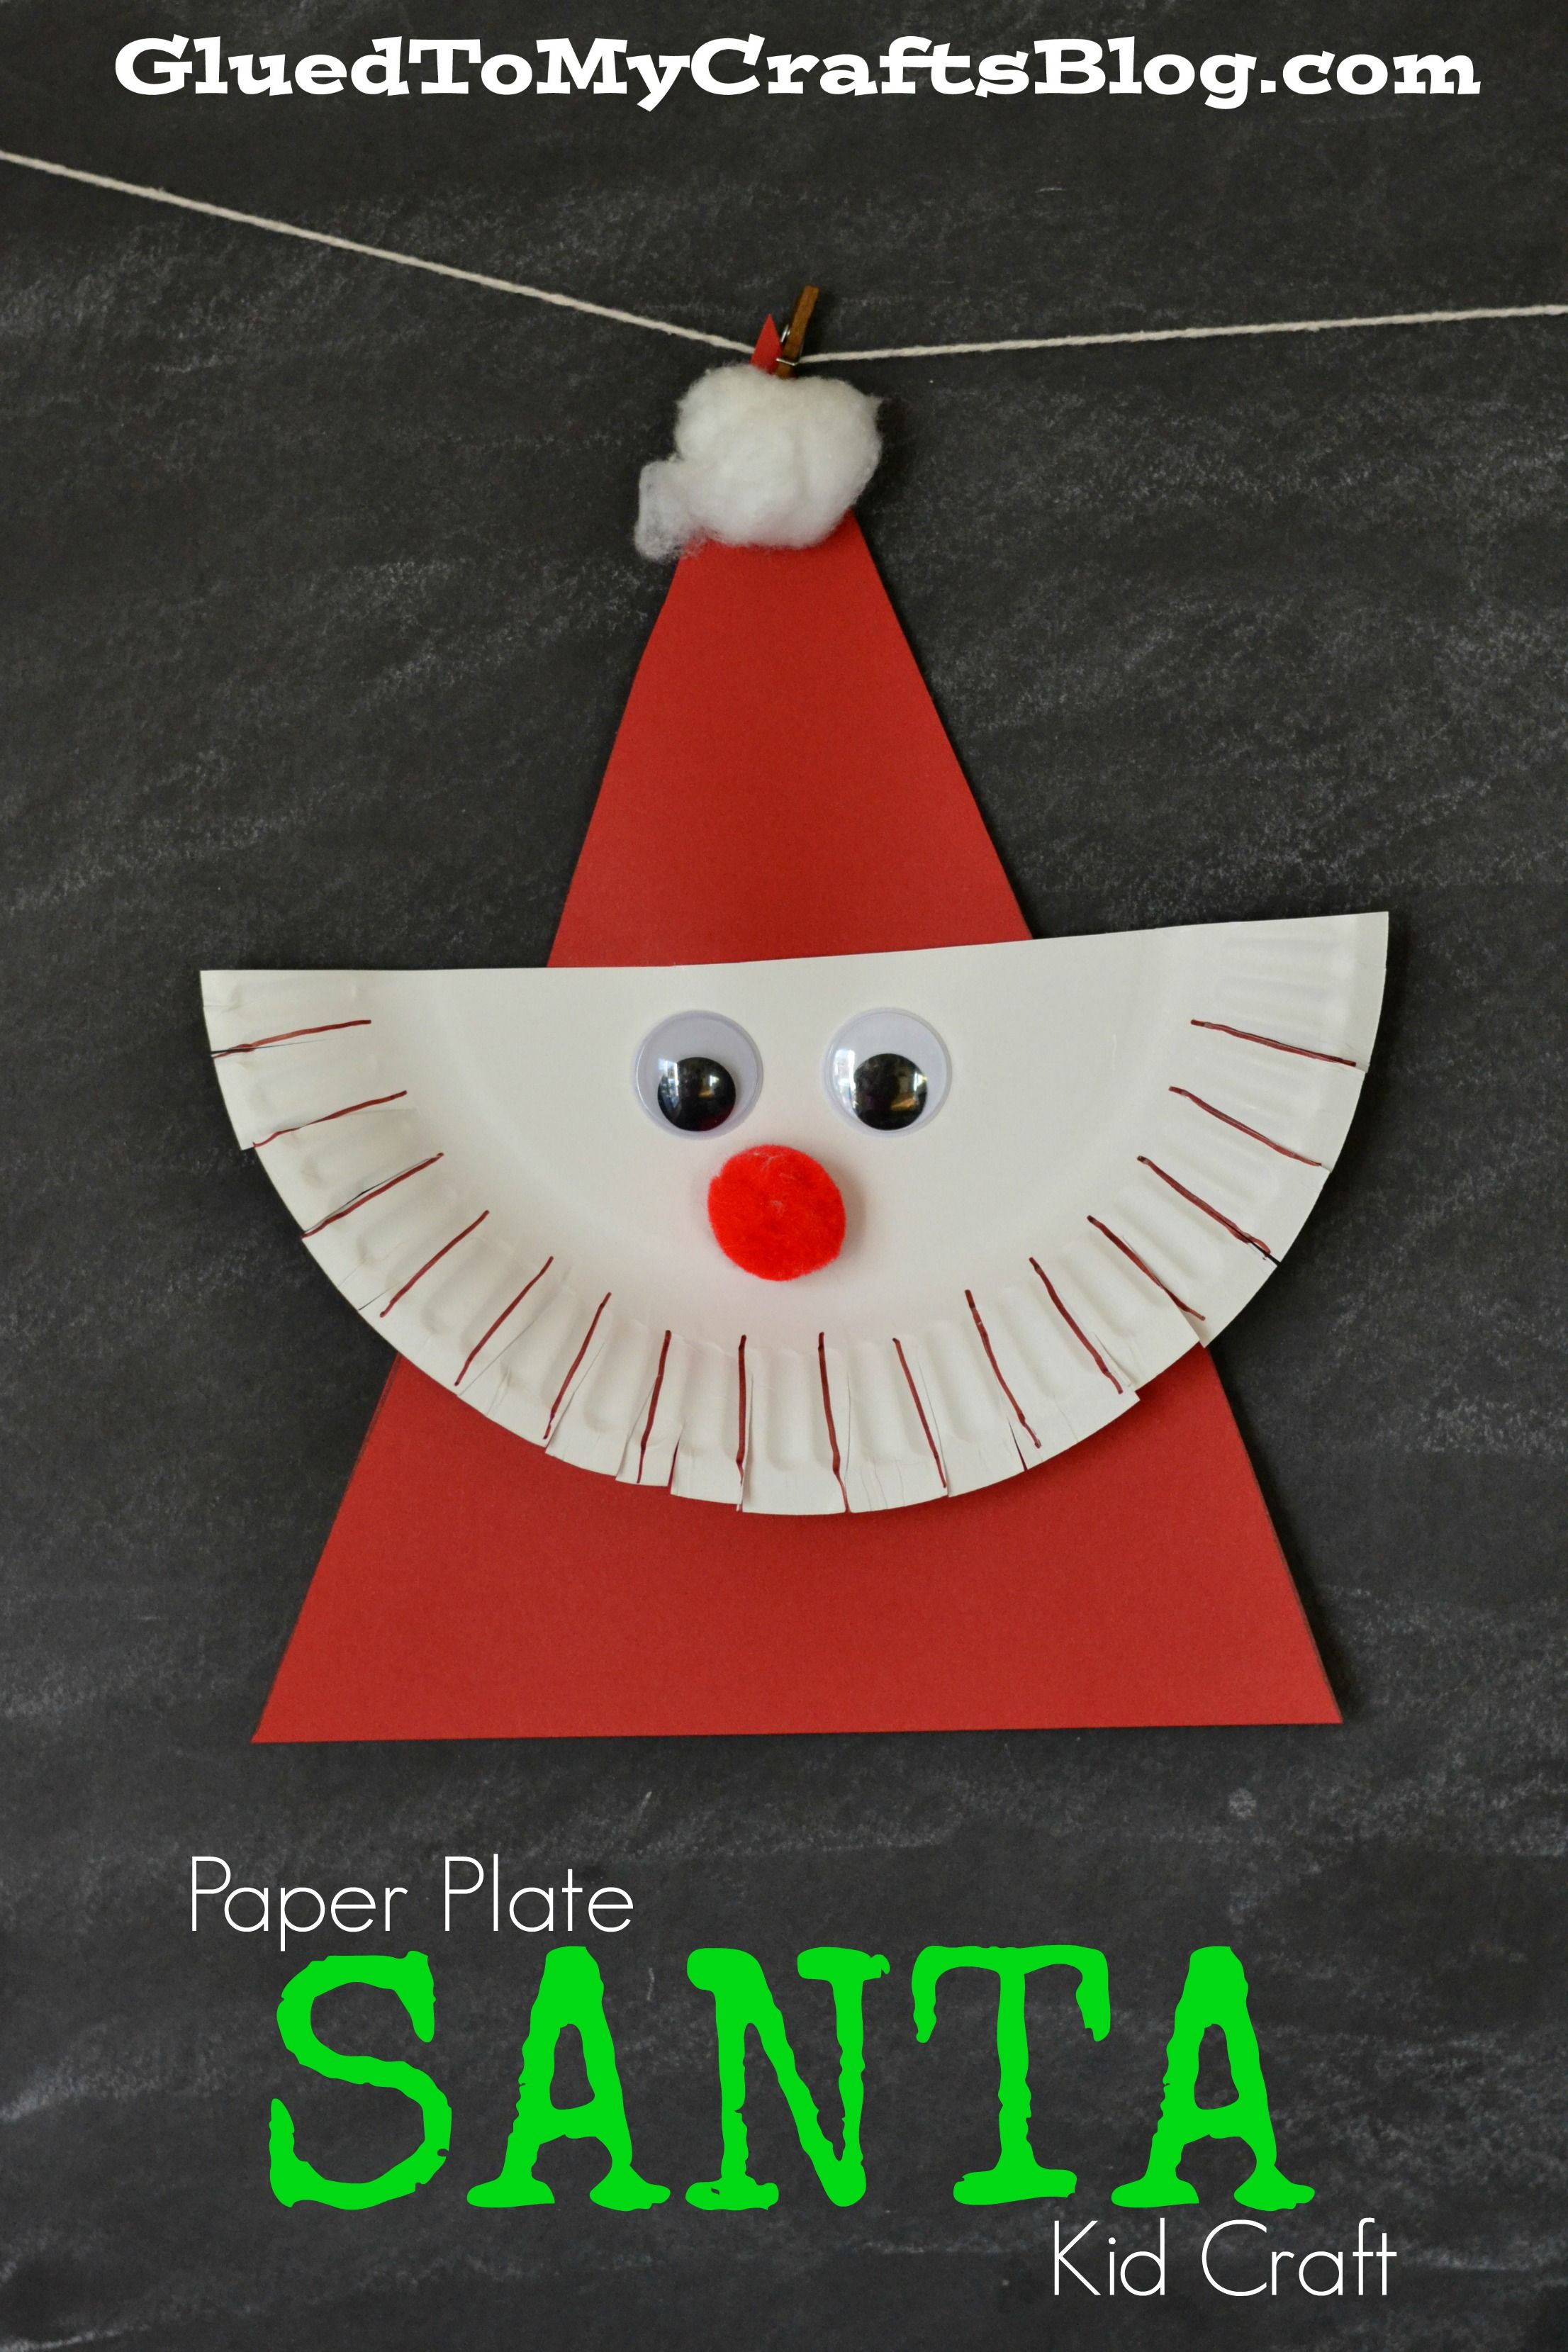 Paper Plate Santa {Kid Craft} Christmas crafts